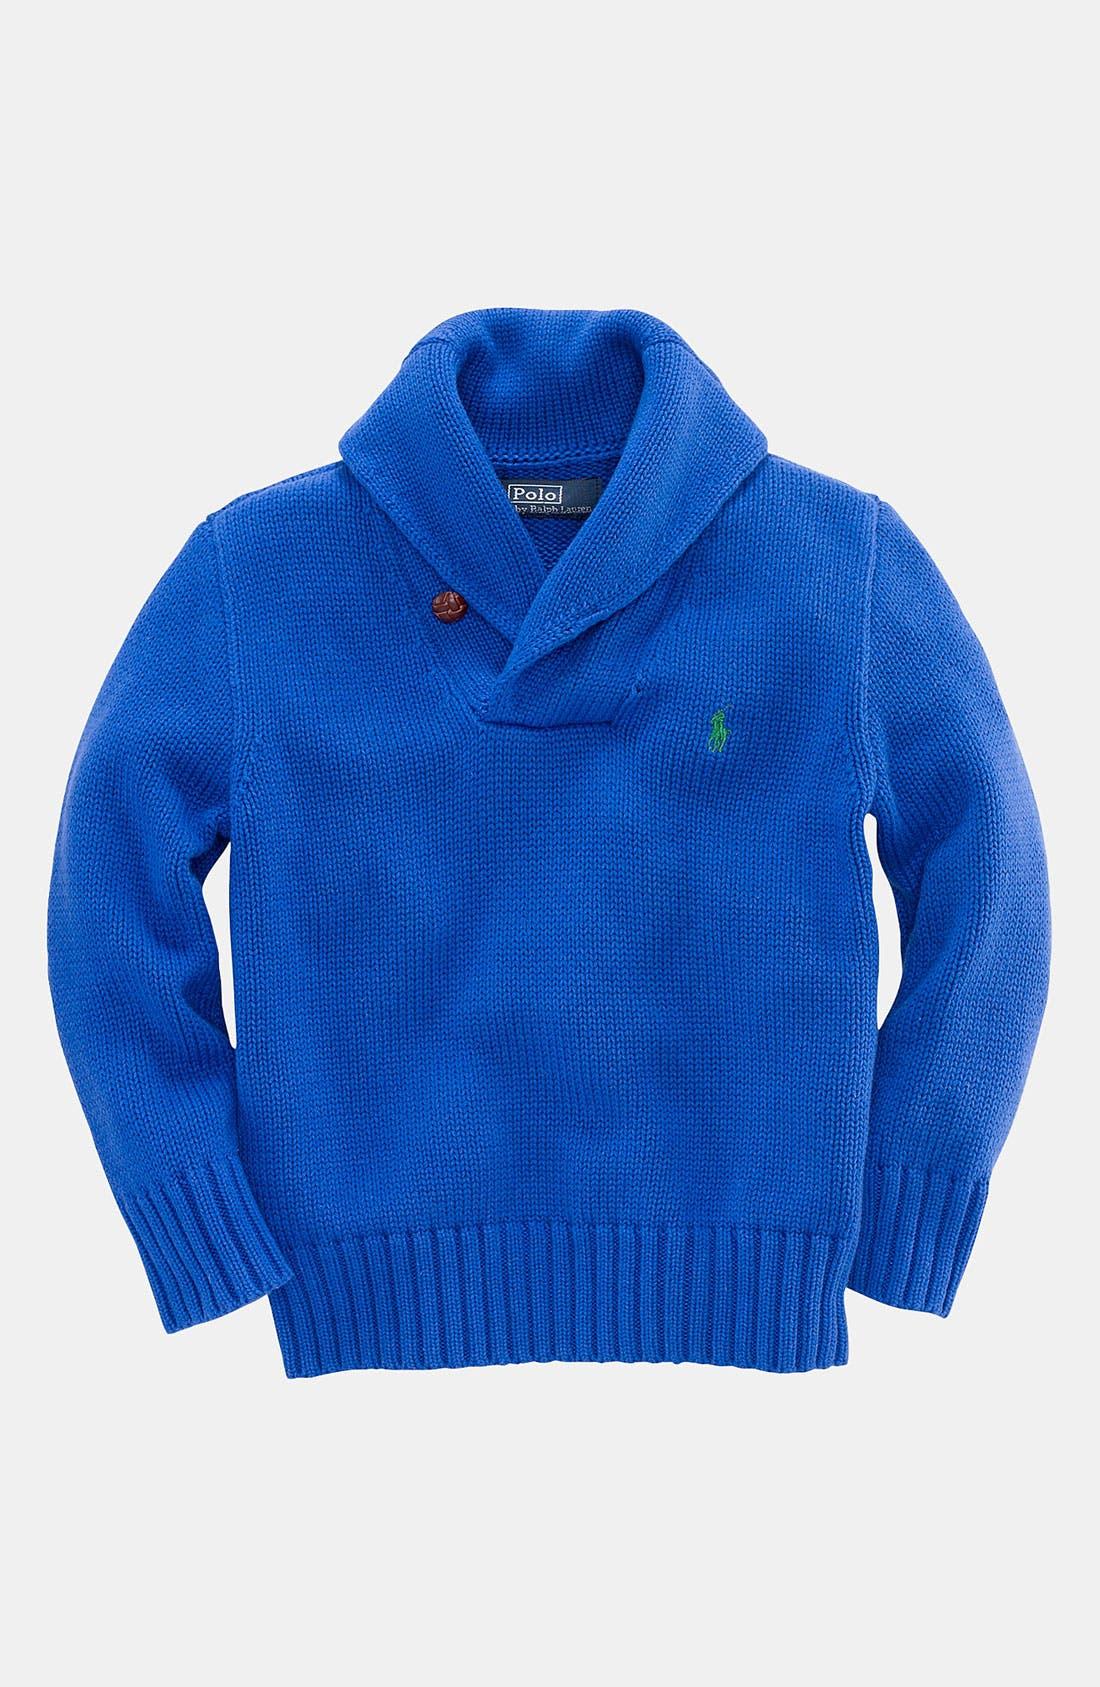 Main Image - Ralph Lauren Shawl Collar Sweater (Toddler)